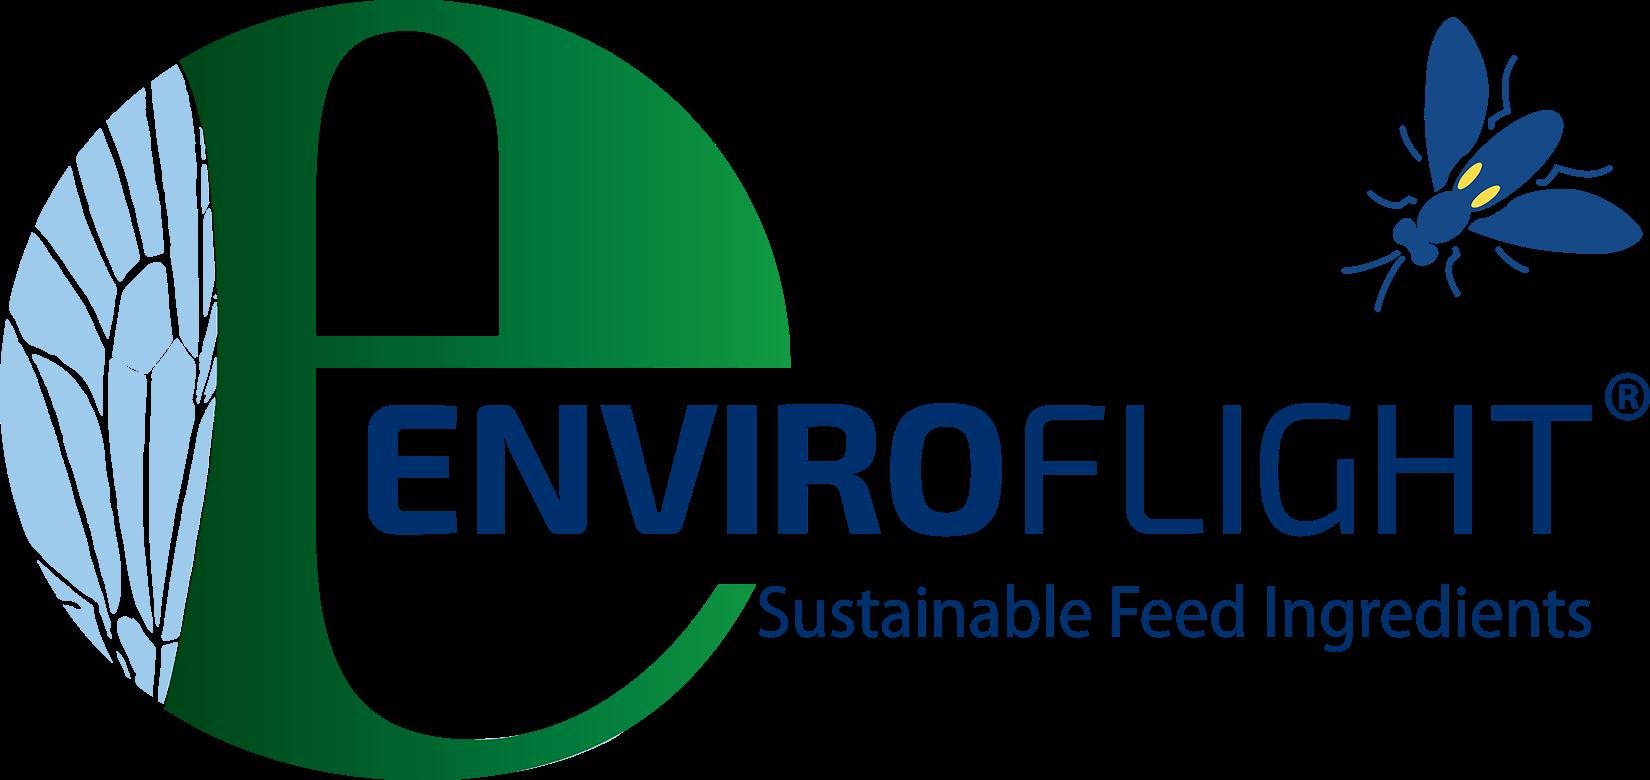 Enviroflight Logo with Tag